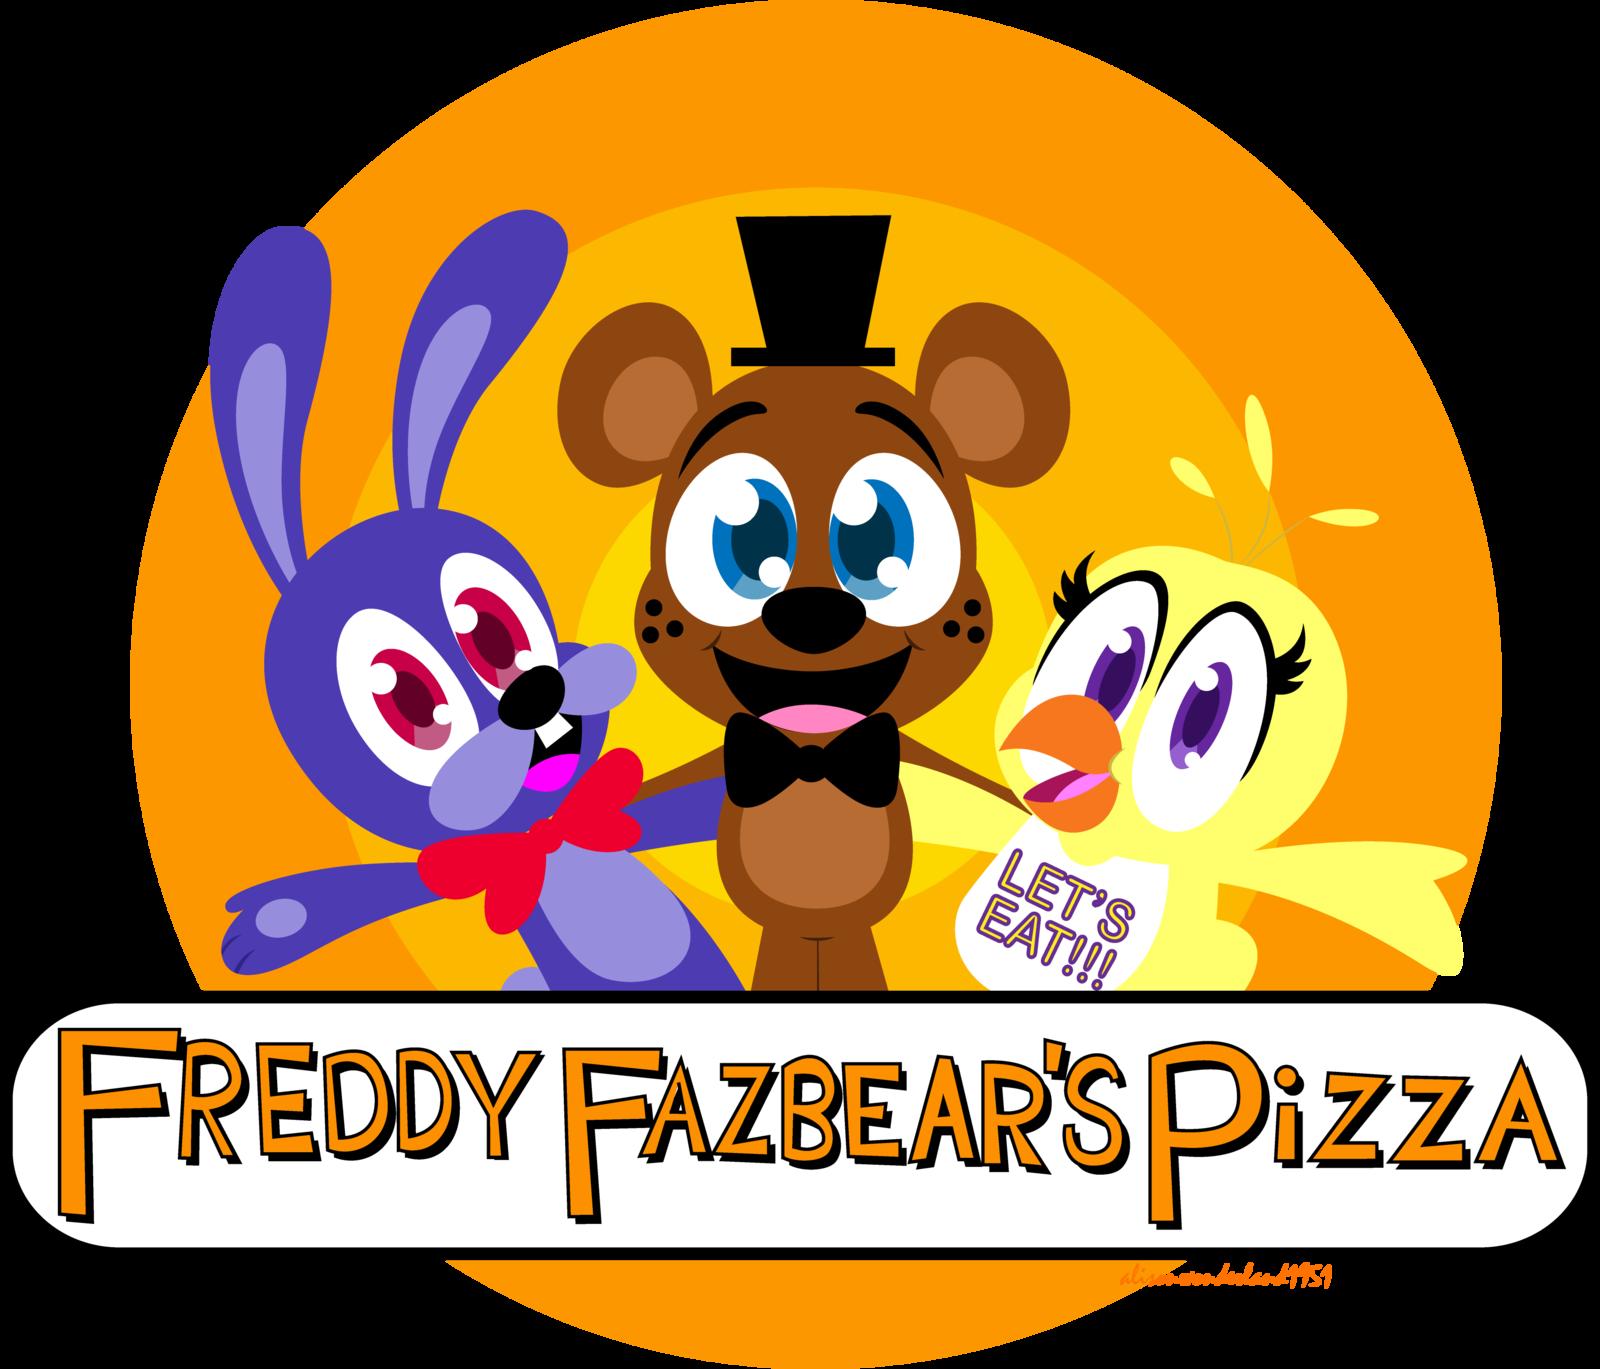 Freddy Fazbear S Pizza Logo